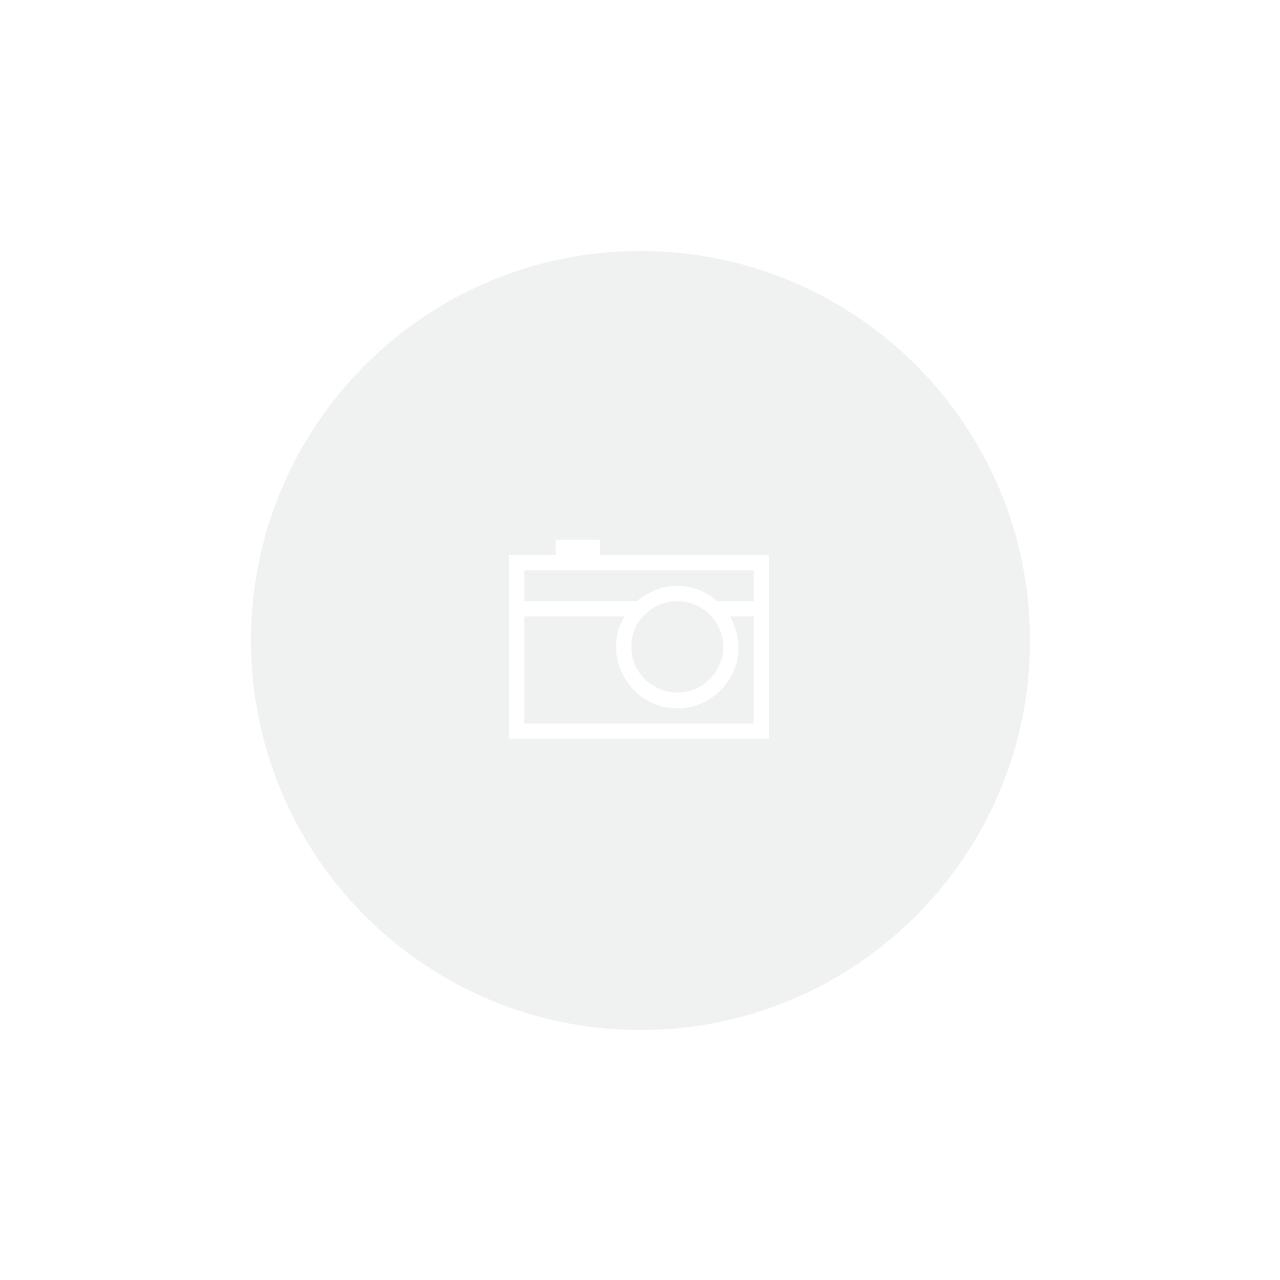 Papel Artesanal Indiano - Ref. 65